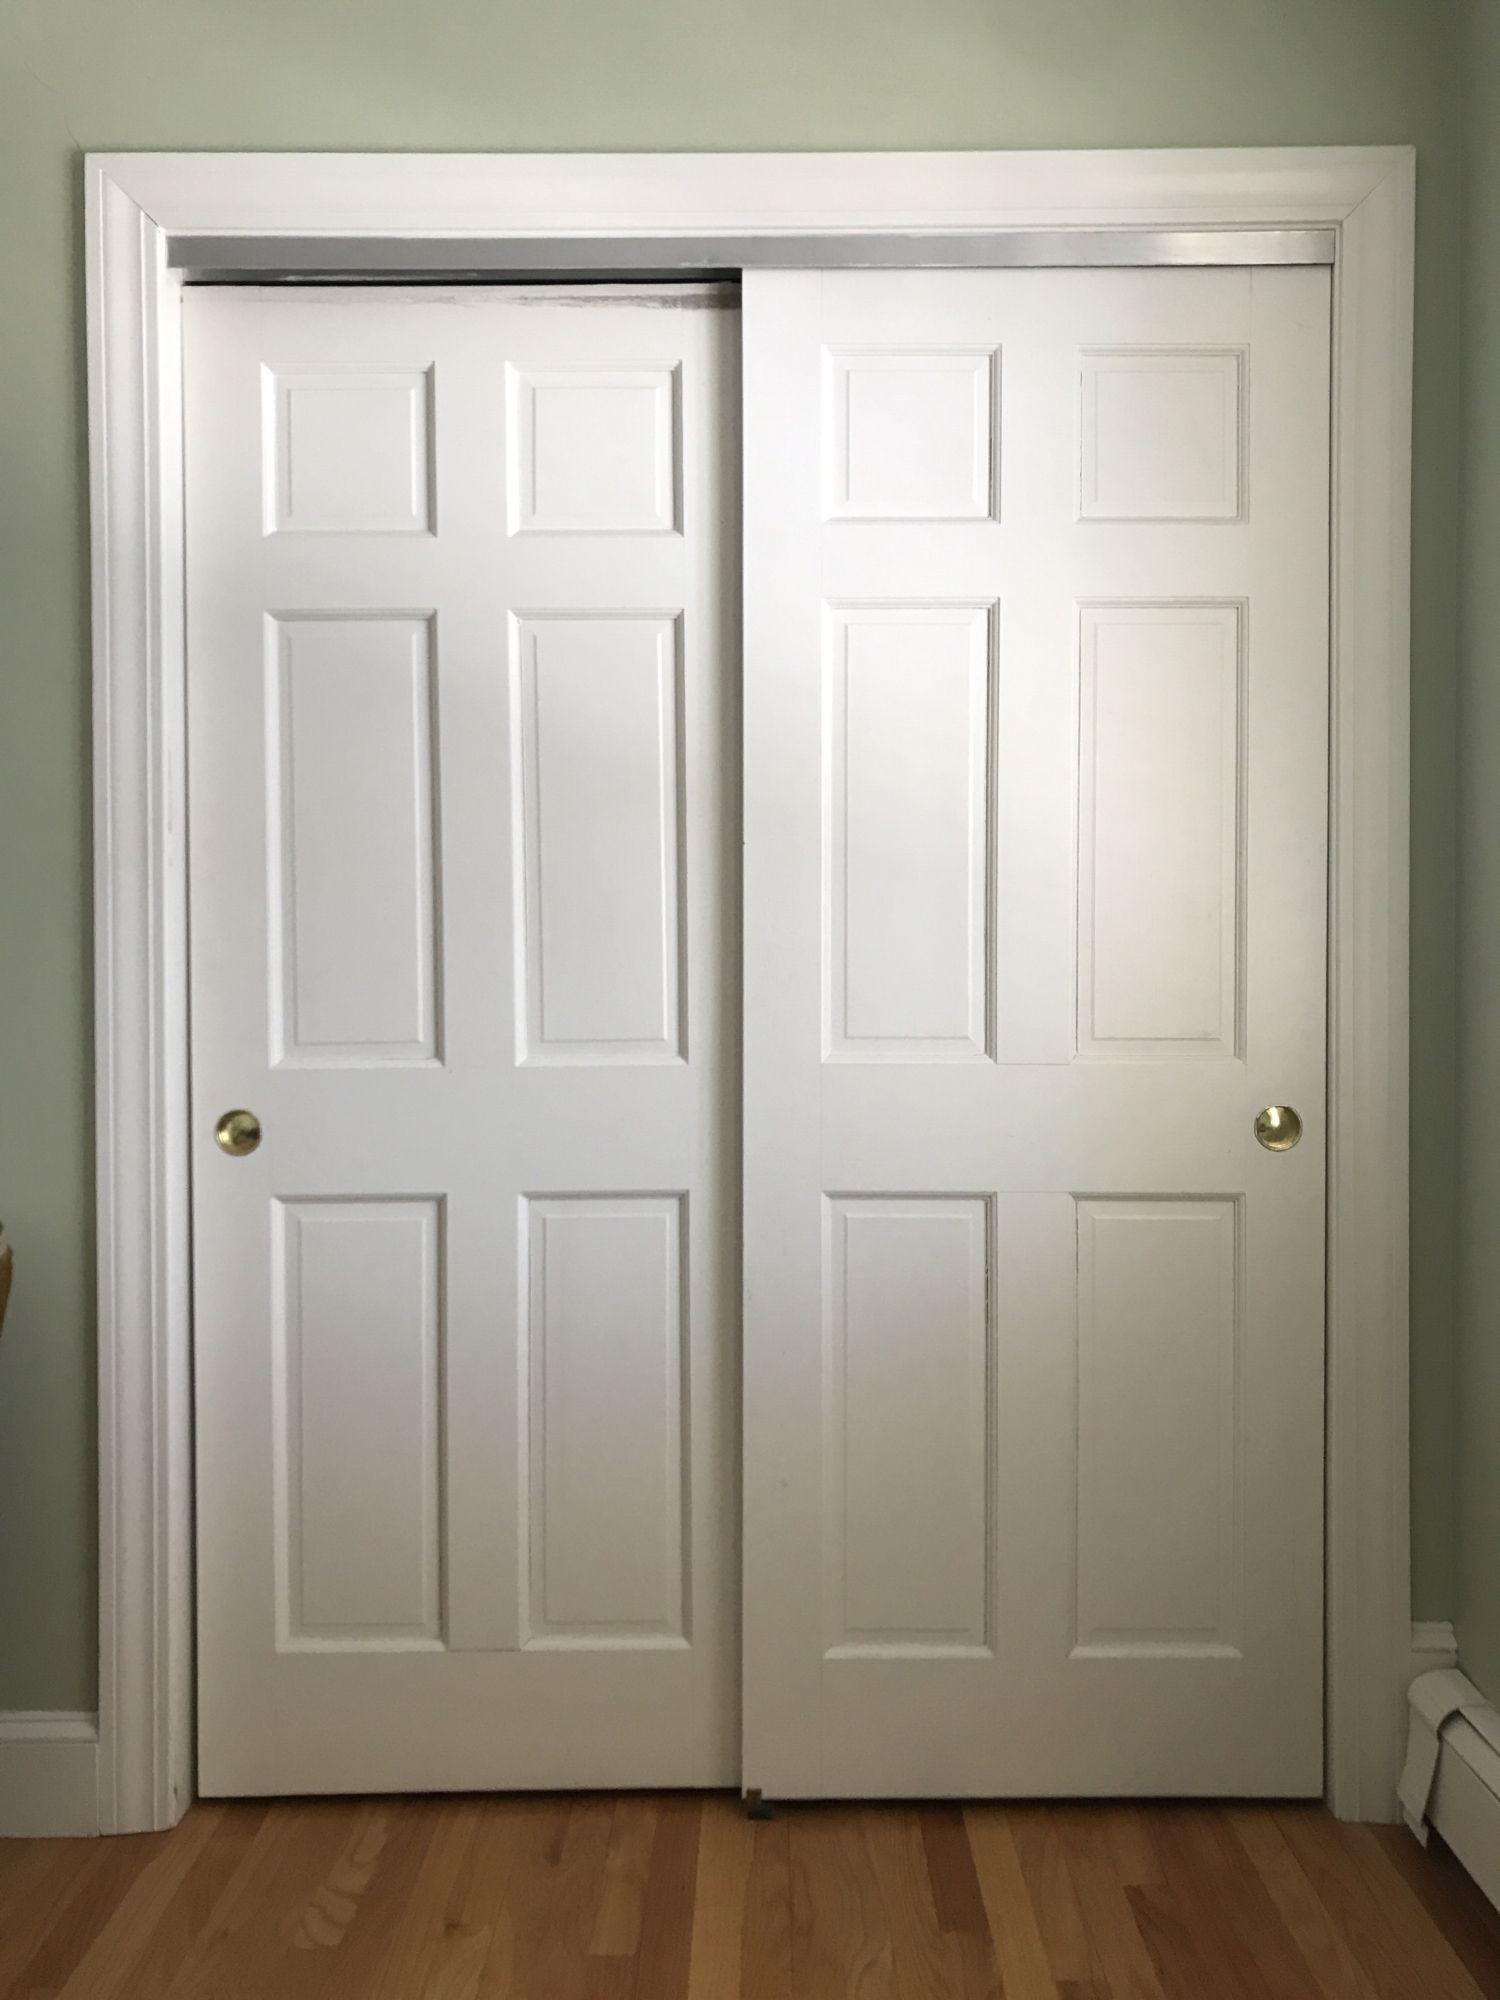 How To Convert Sliding Doors To Hinged Doors Wood Sliding Closet